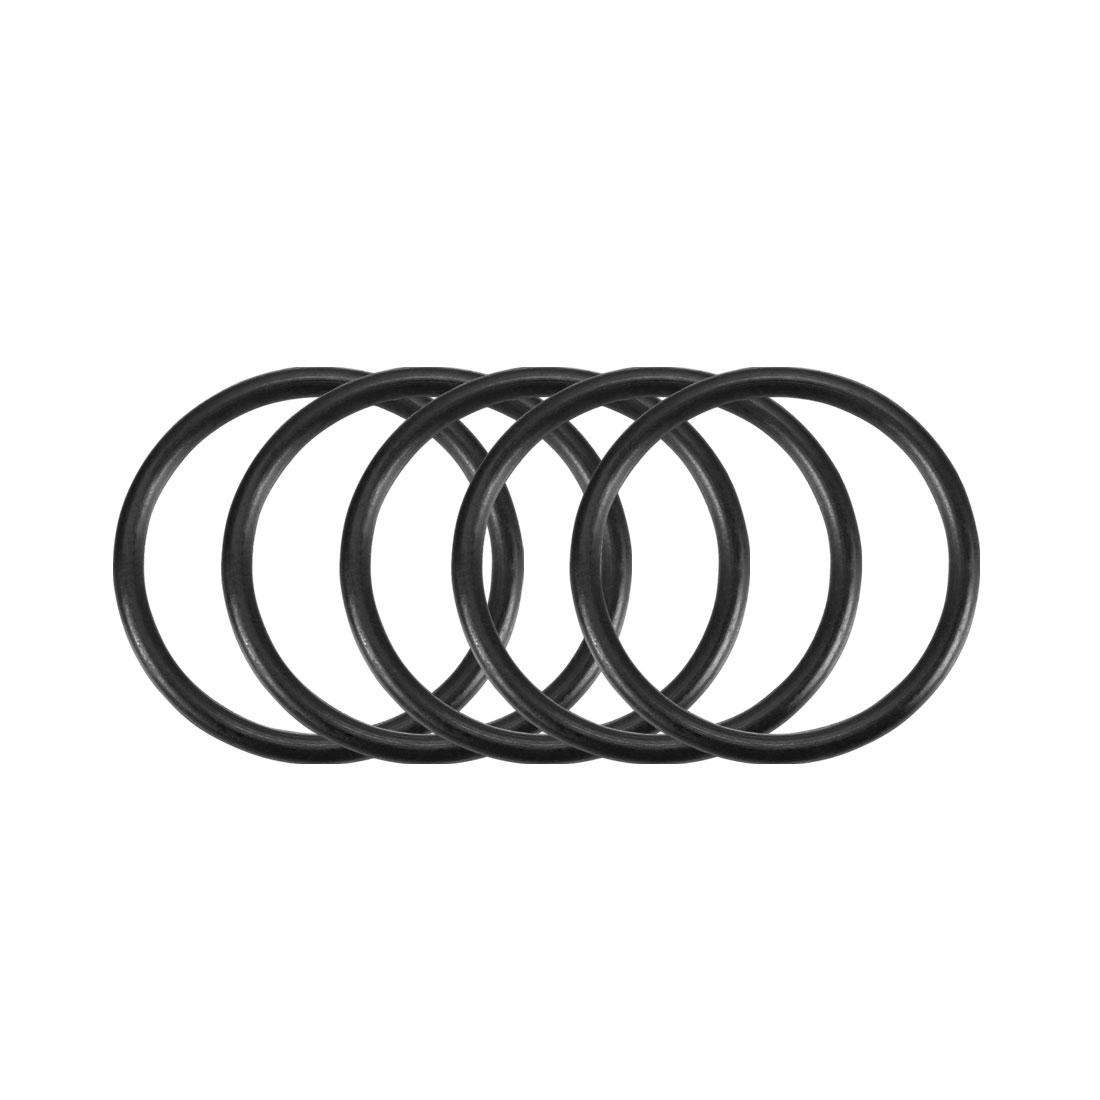 100Pcs Black 20mm x 1.5mm Nitrile Rubber O Ring NBR Oil Sealing Grommets